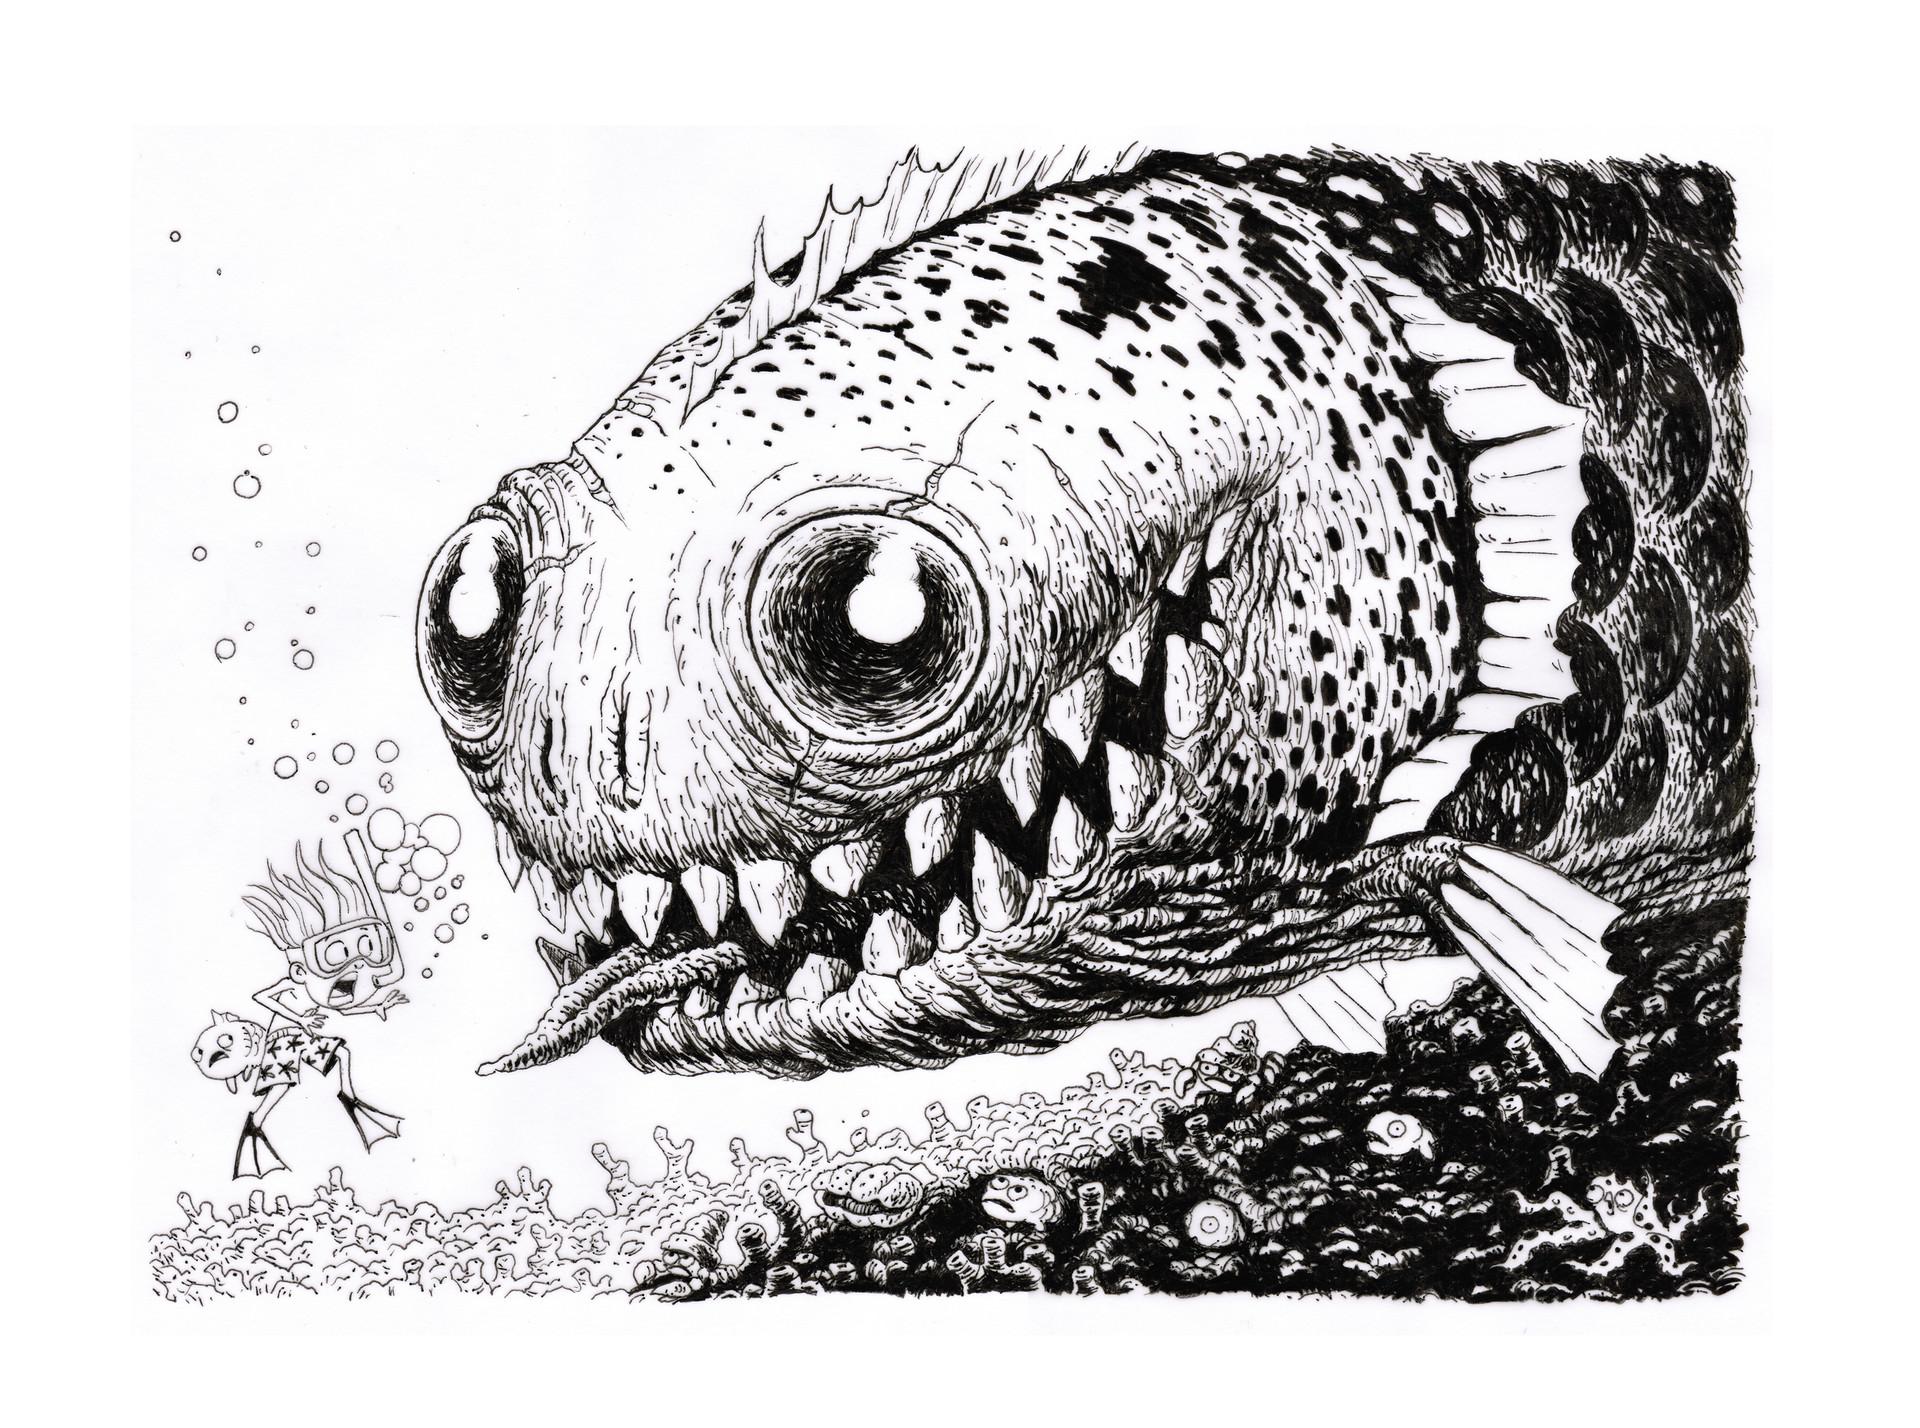 Jim bryson 53 aggressivefish ink 01